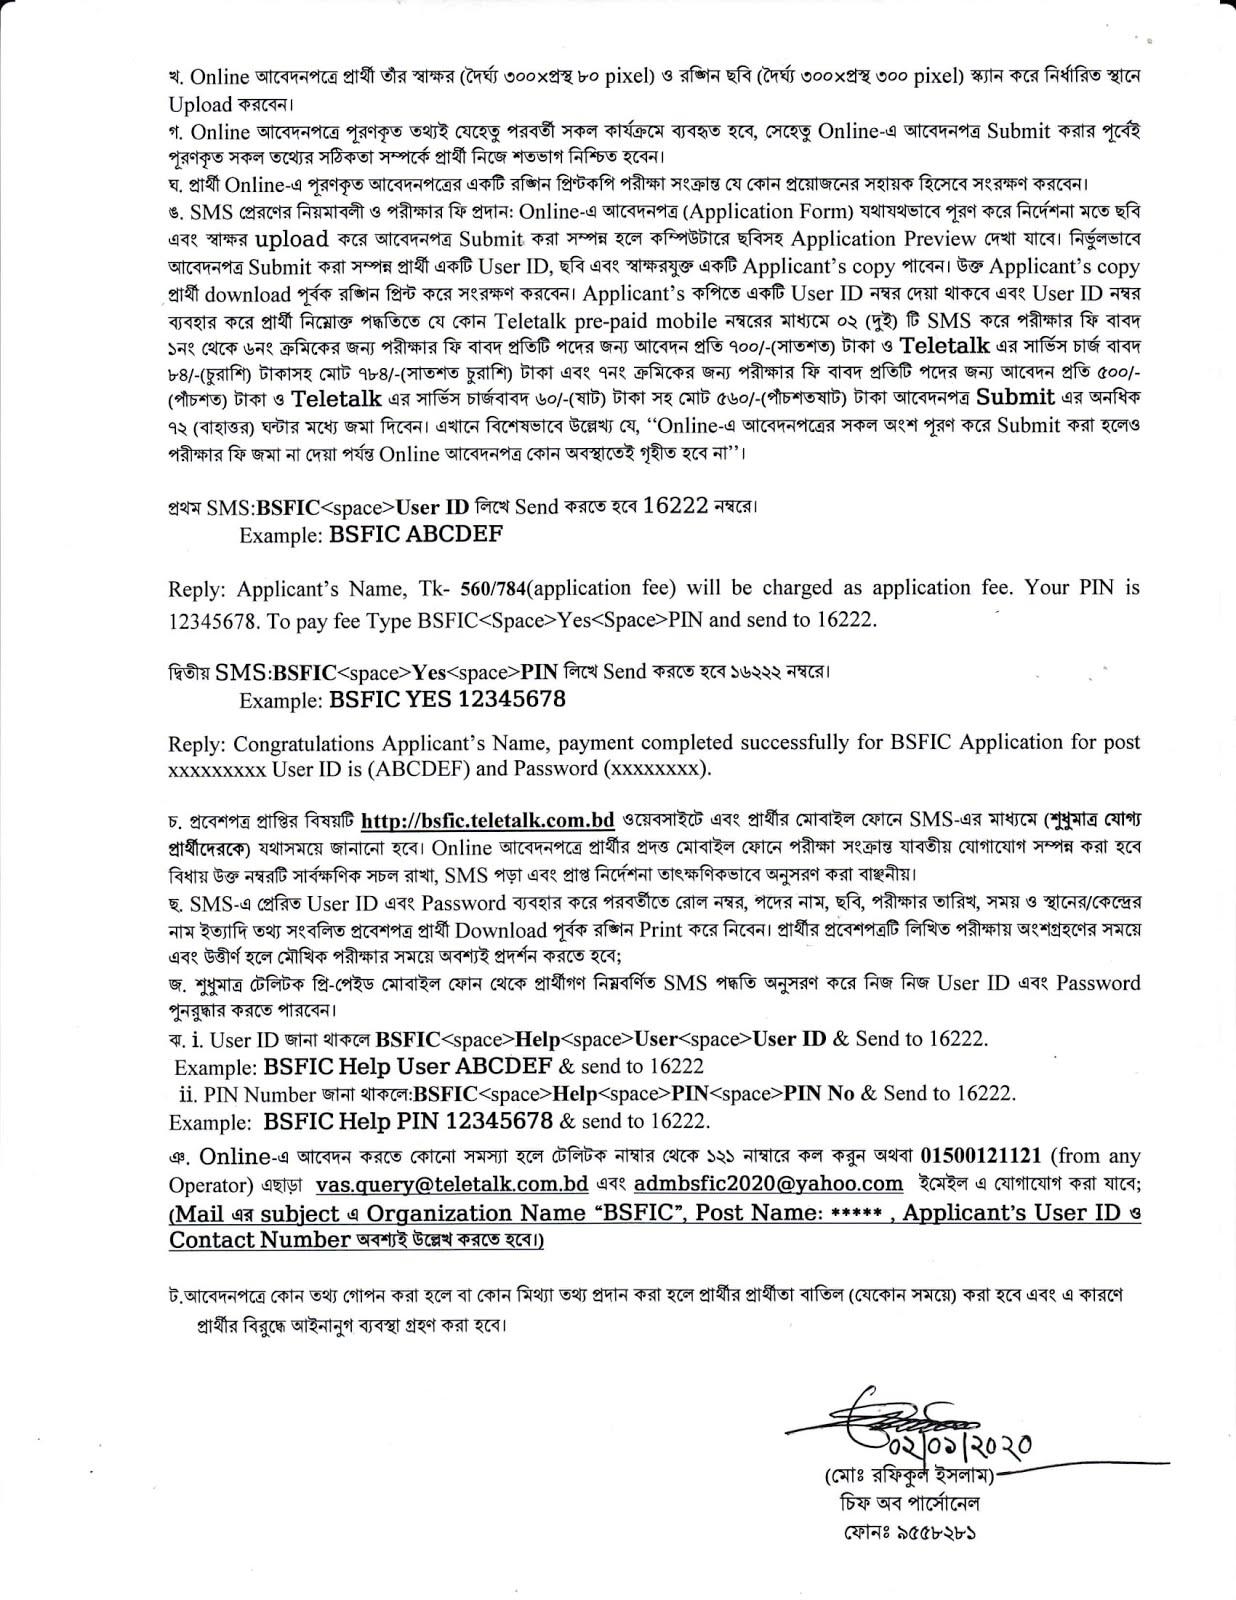 BSFIC Job circular 2020 বাংলাদেশ চিনি ও খাদ্য শিল্প কর্পোরেশন